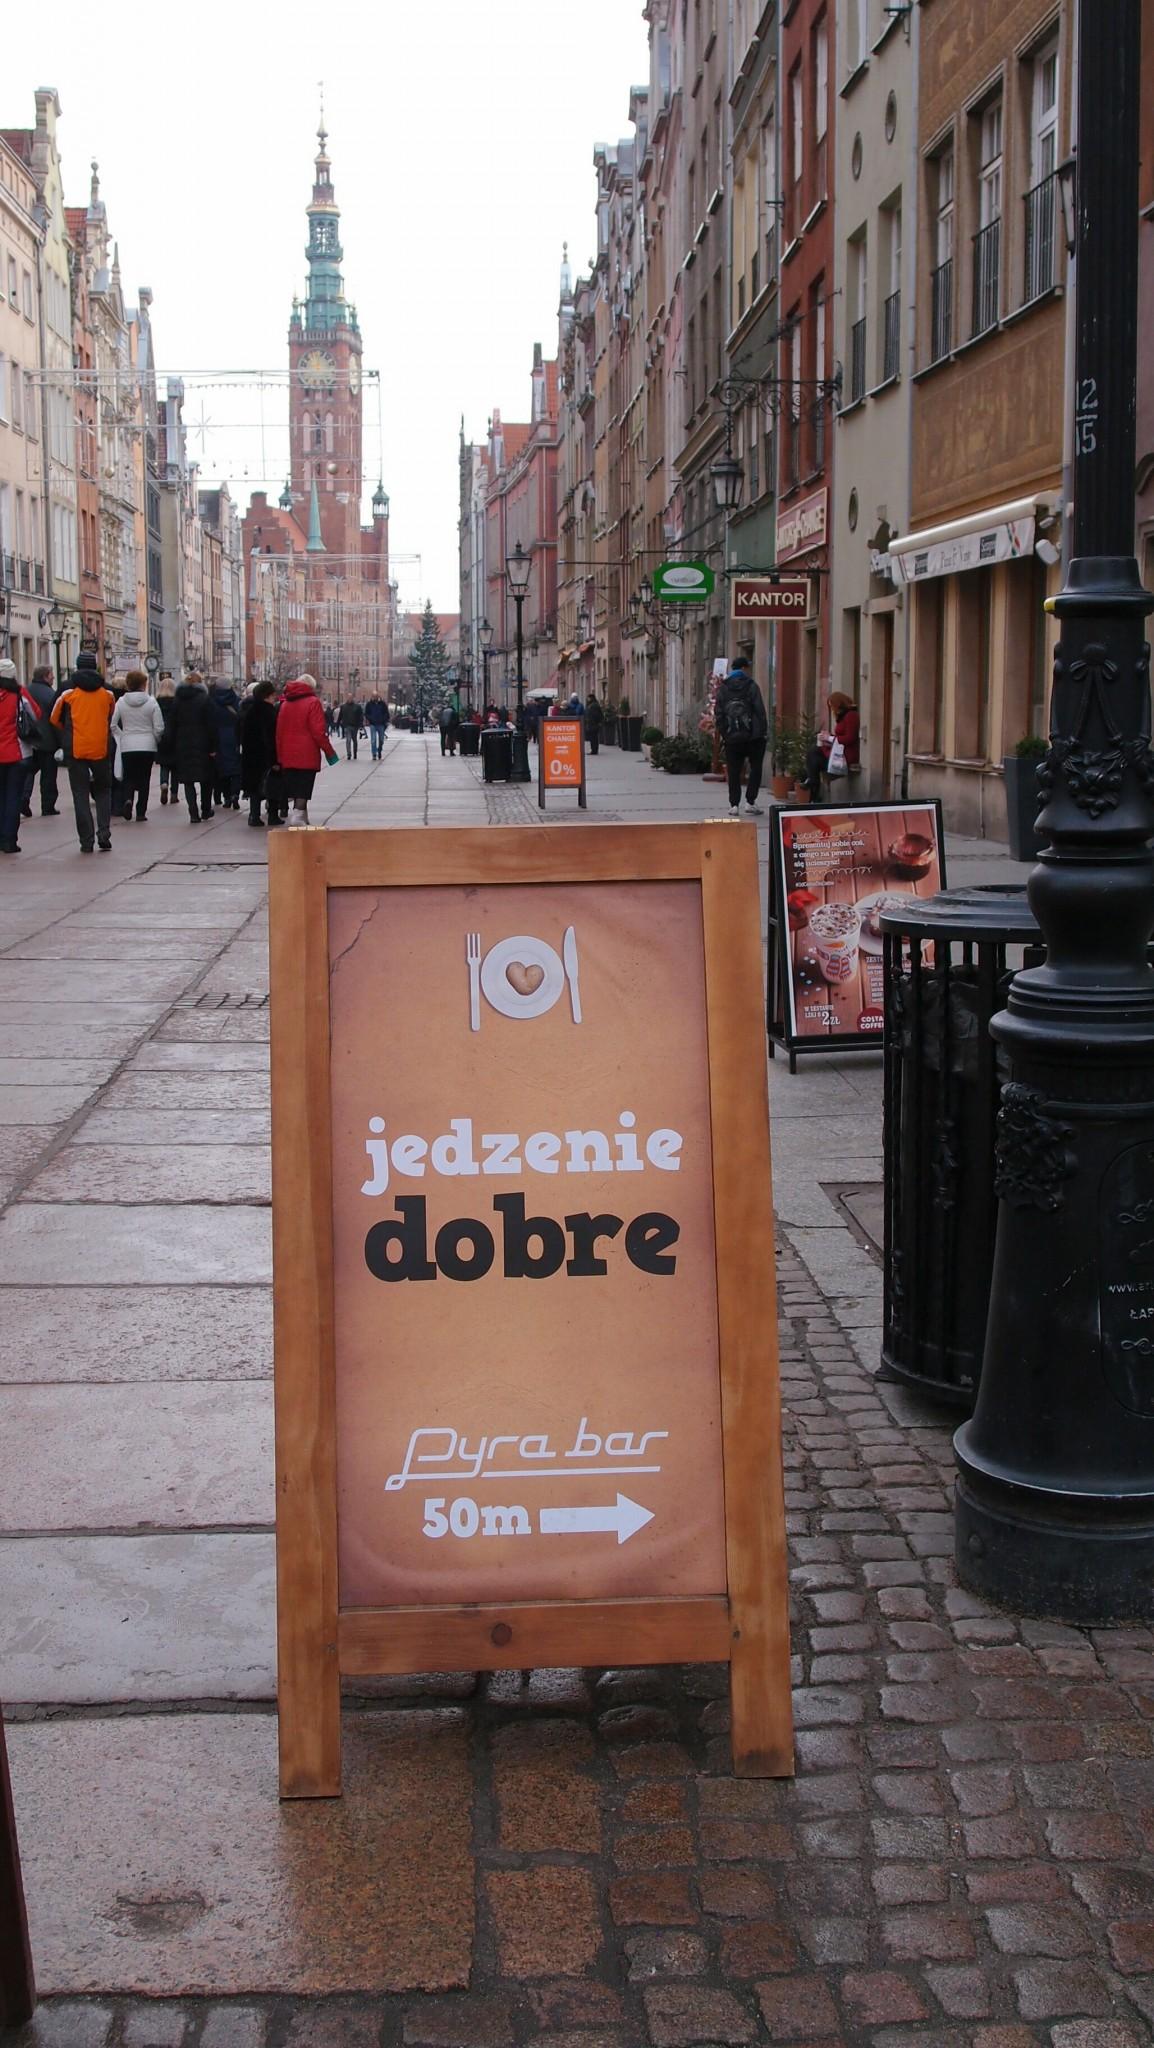 Pyra bar gdansk